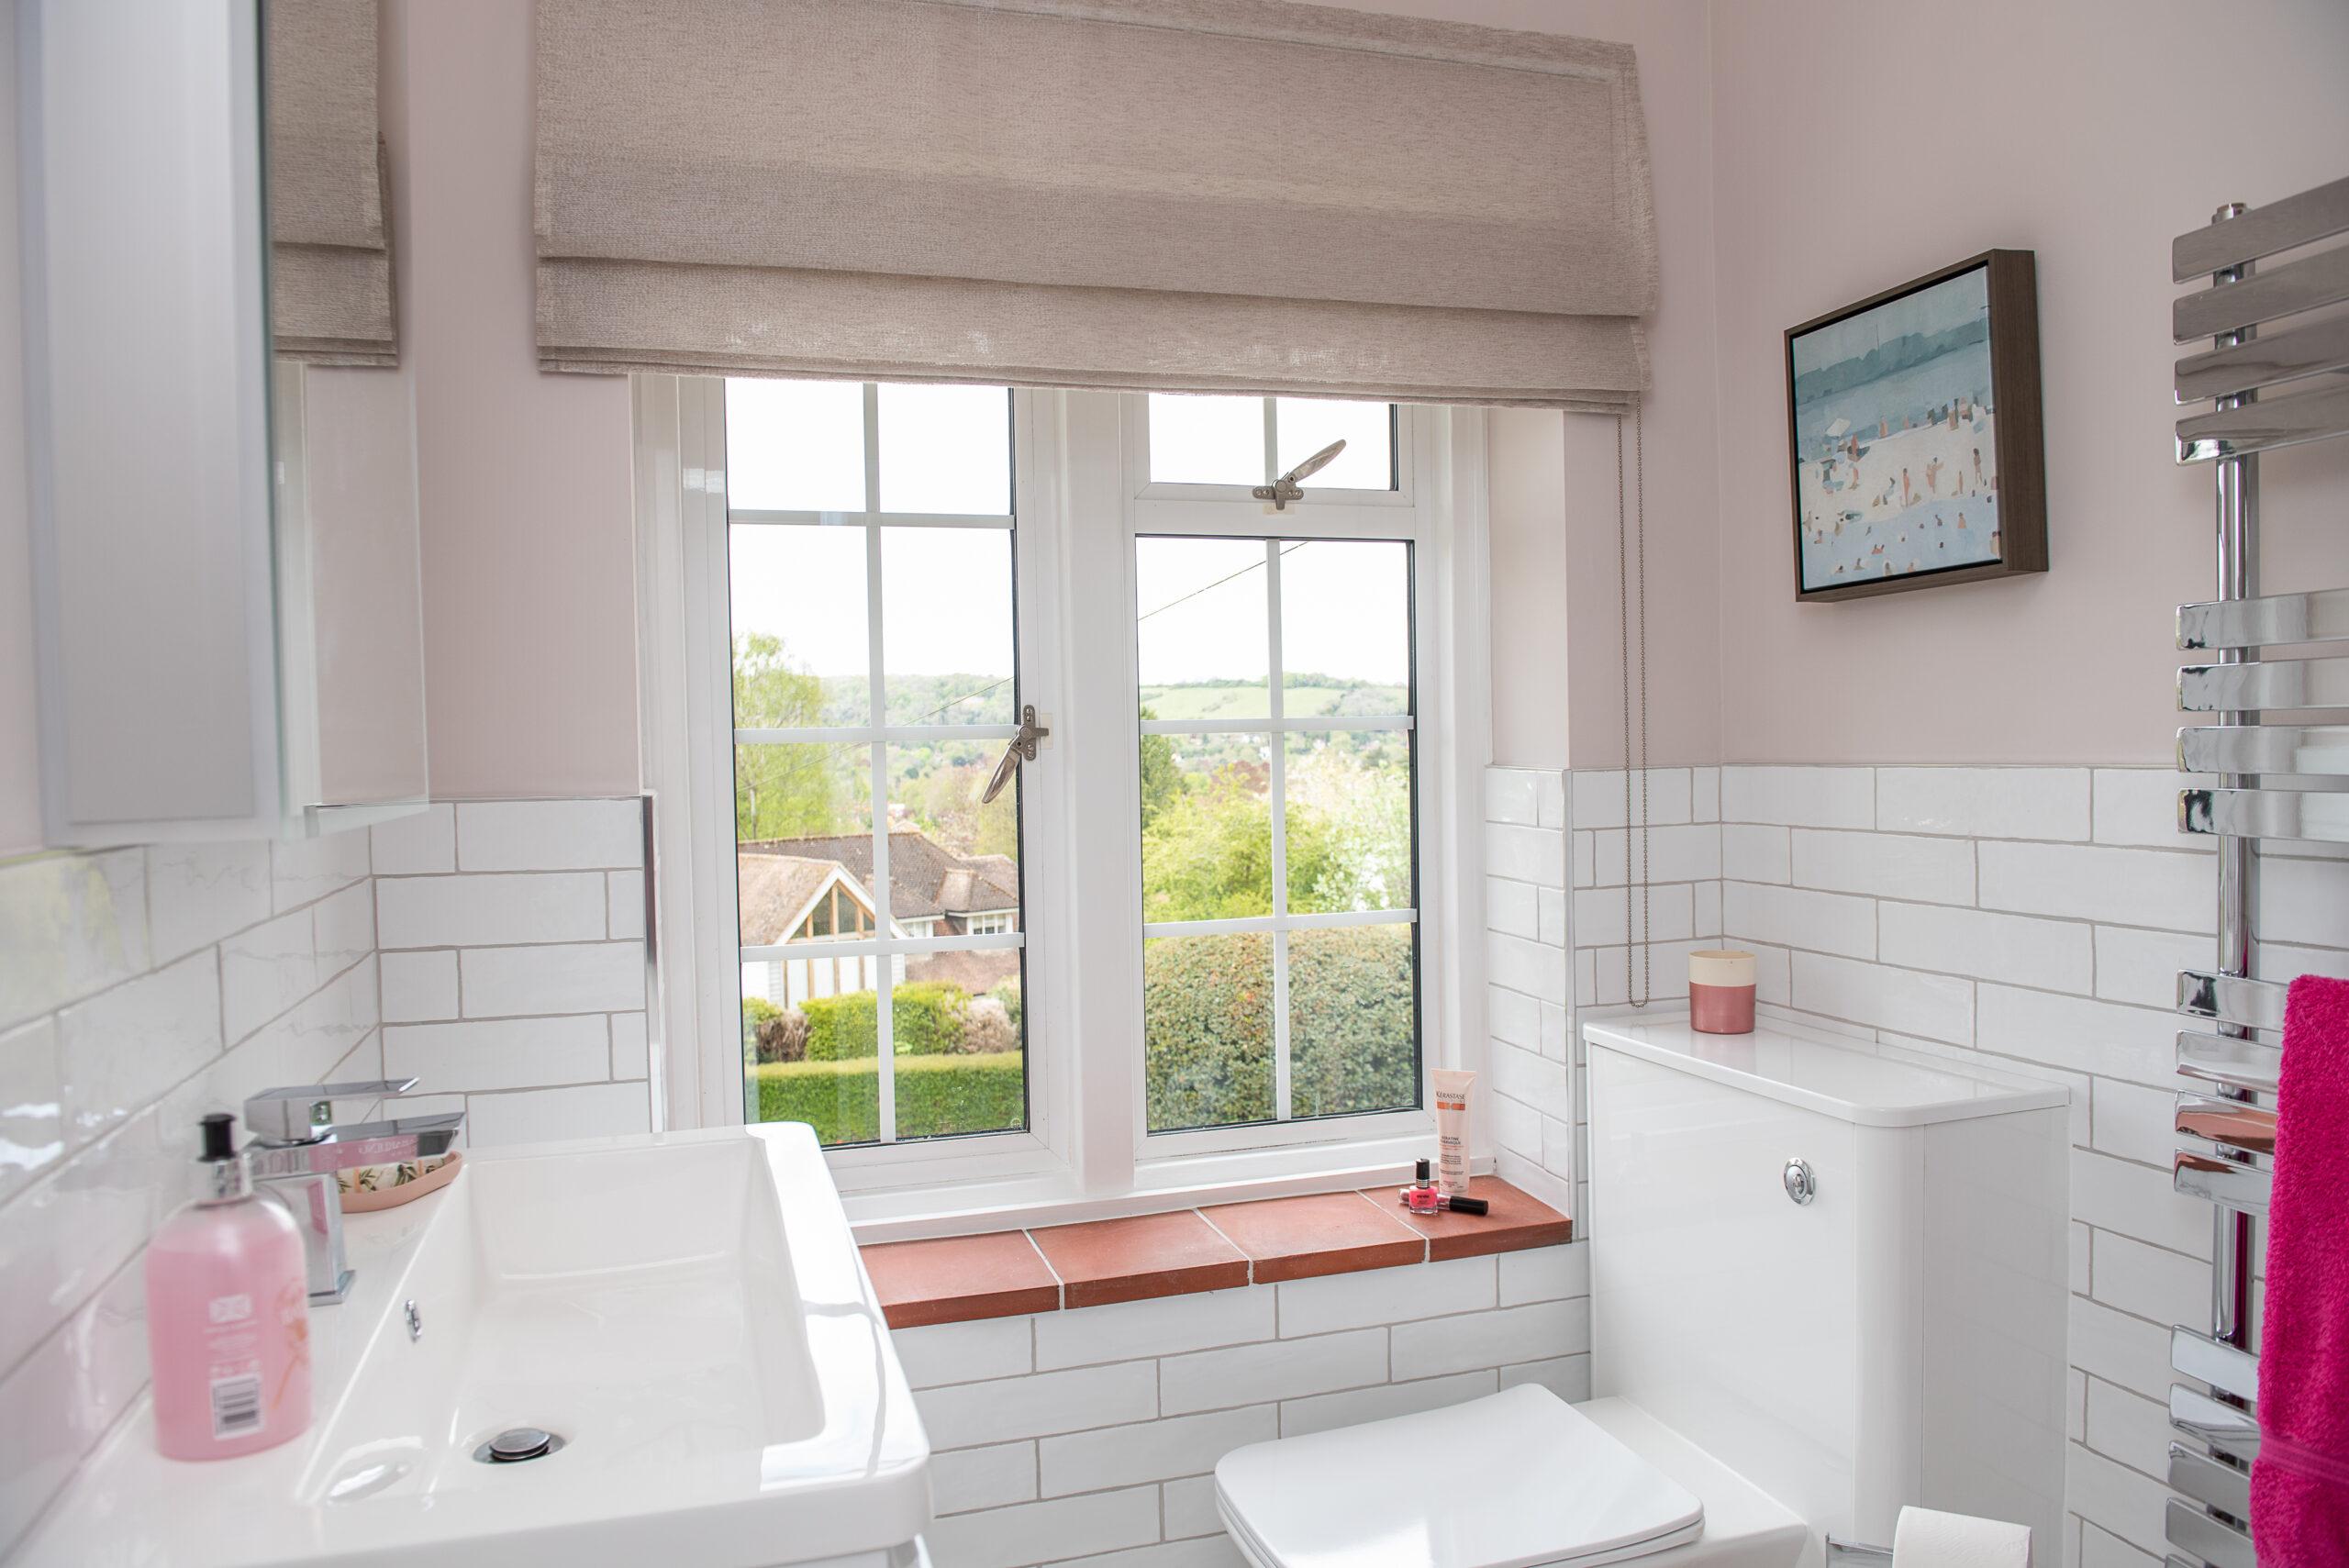 Fairways Goring Ensuite Bathroom Window